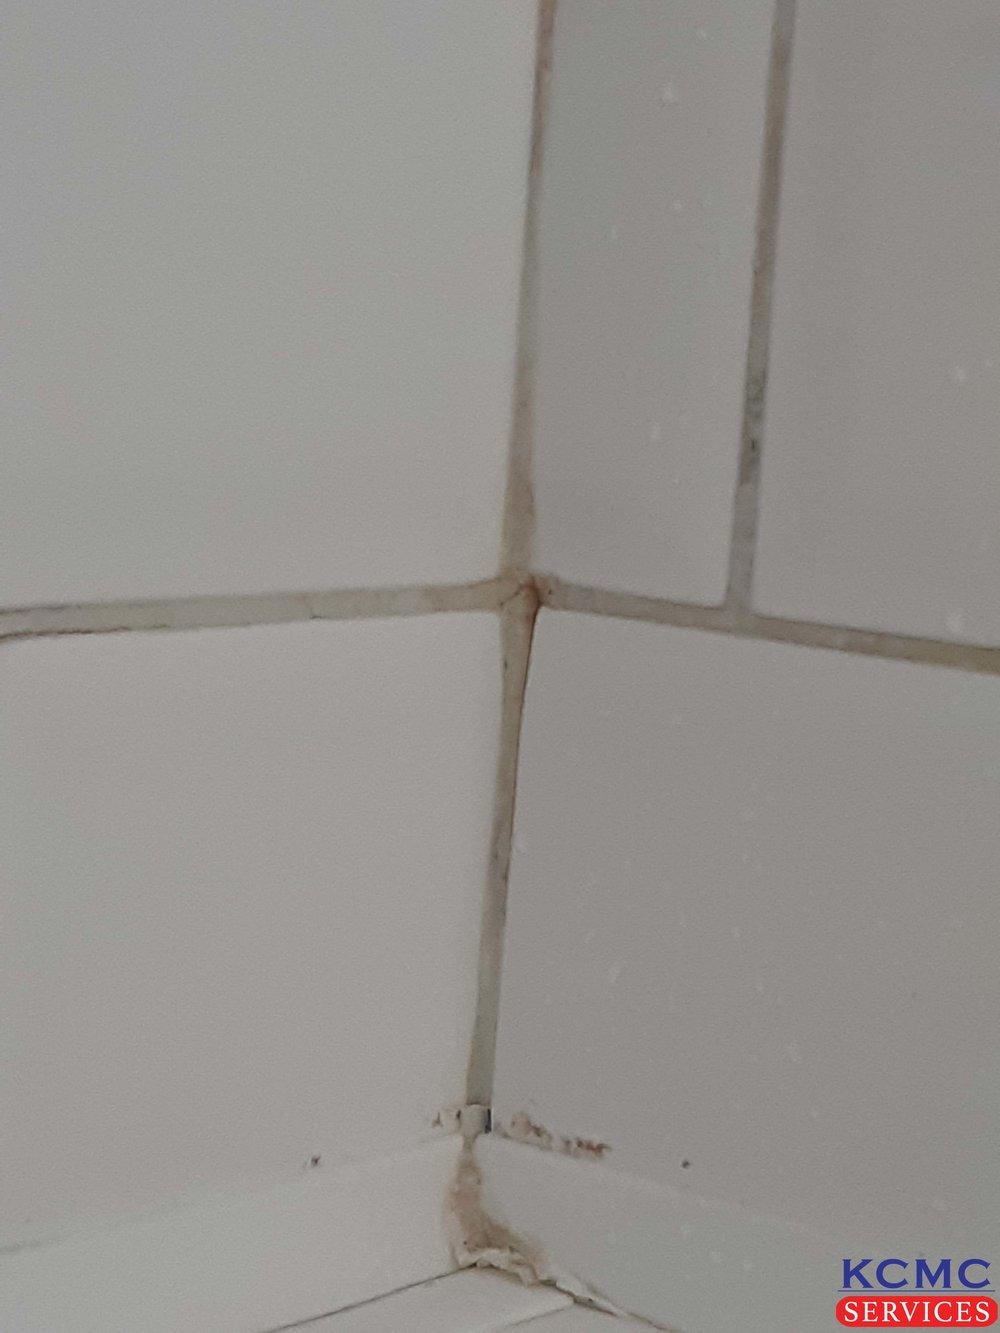 KCMC water damage-16-2.jpg